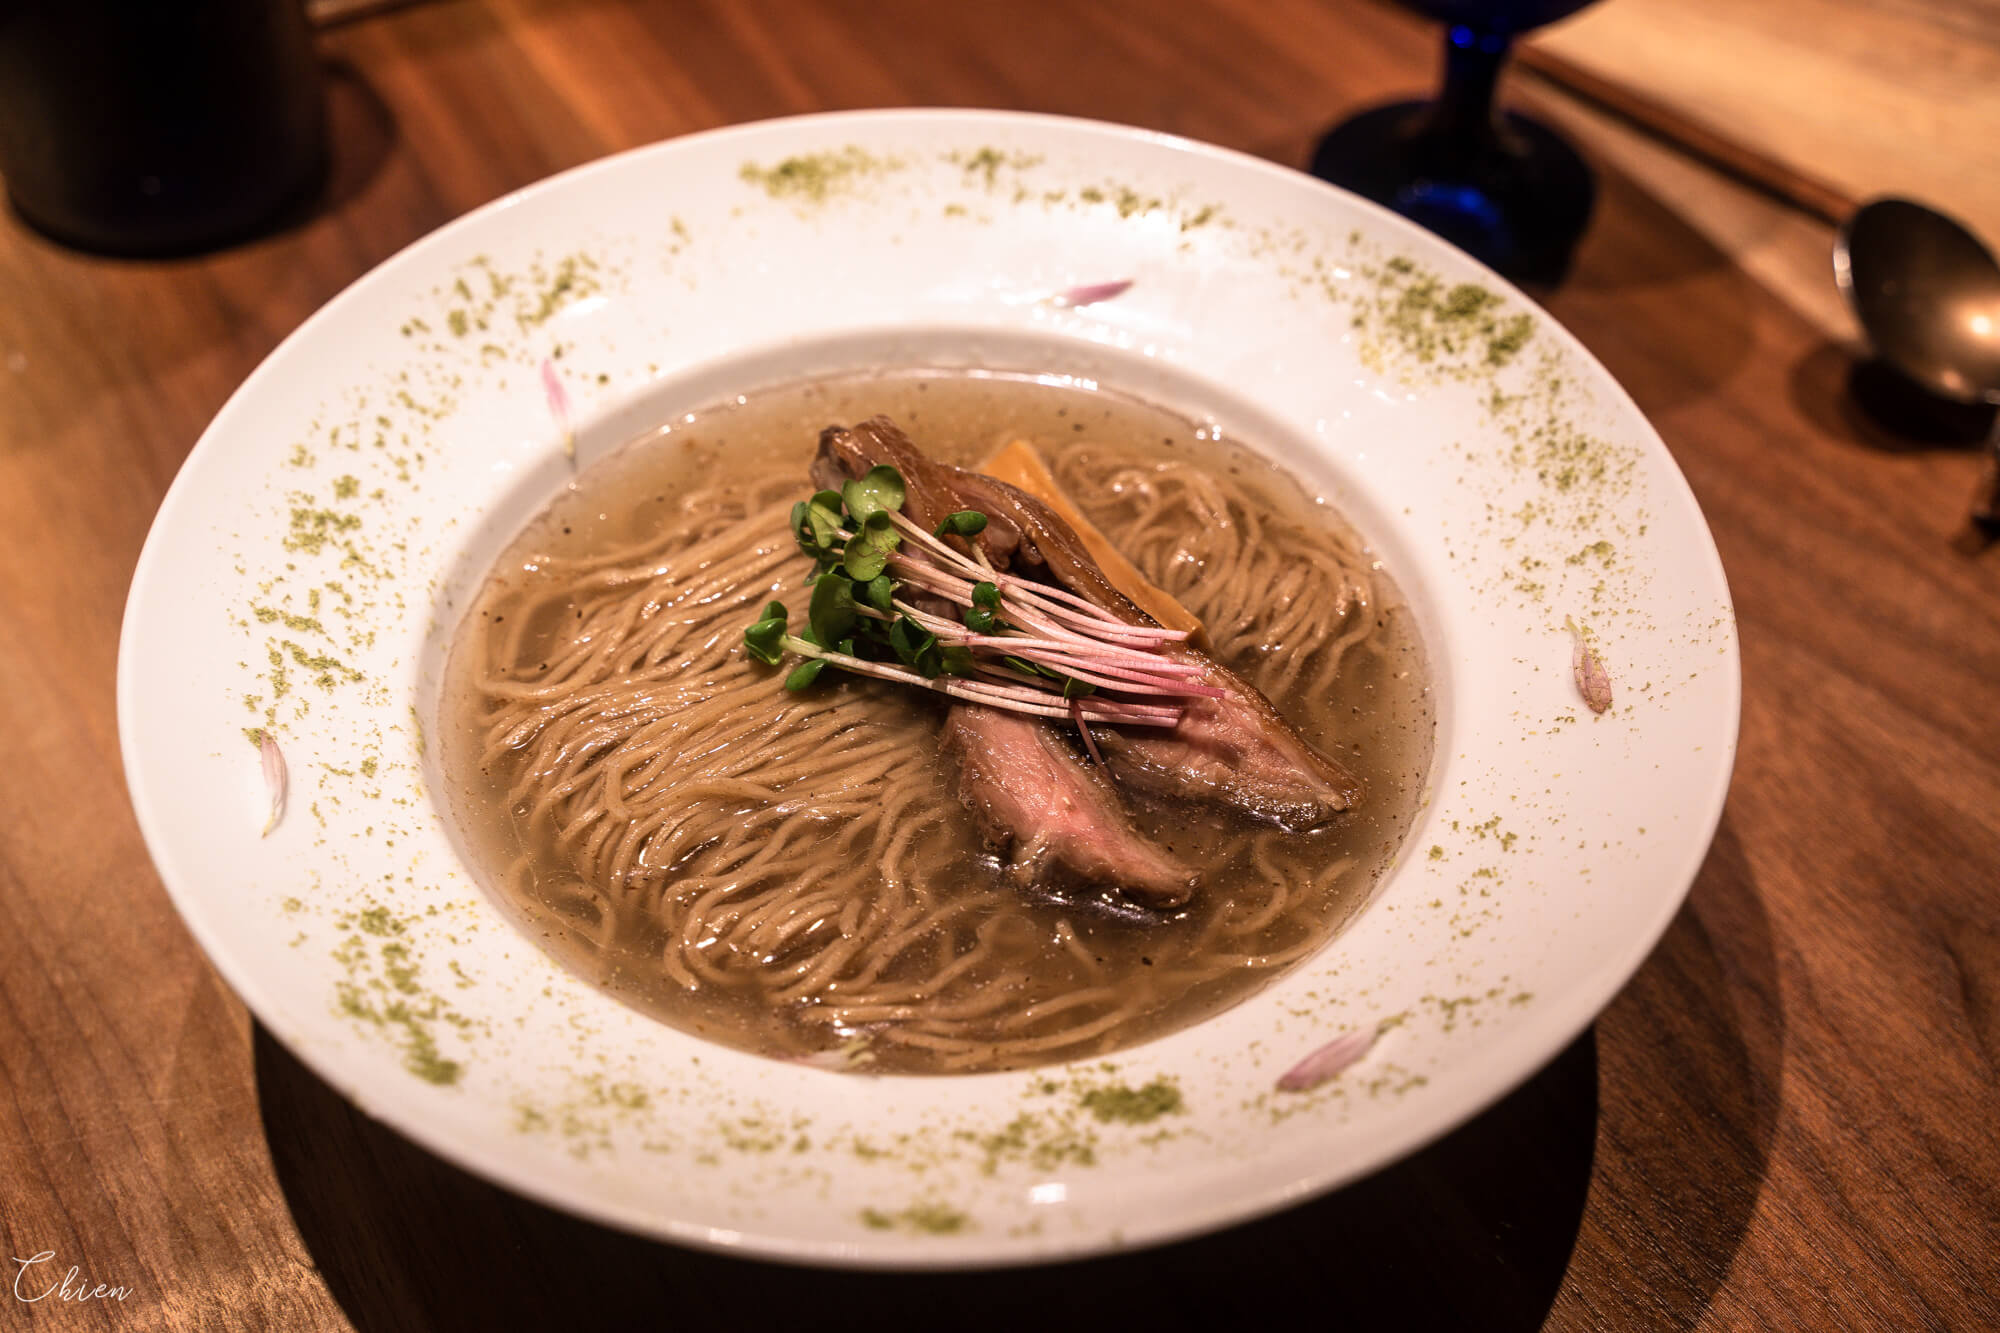 京都祇園鴨肉拉麵 Gion Duck Noodles🦆🍜